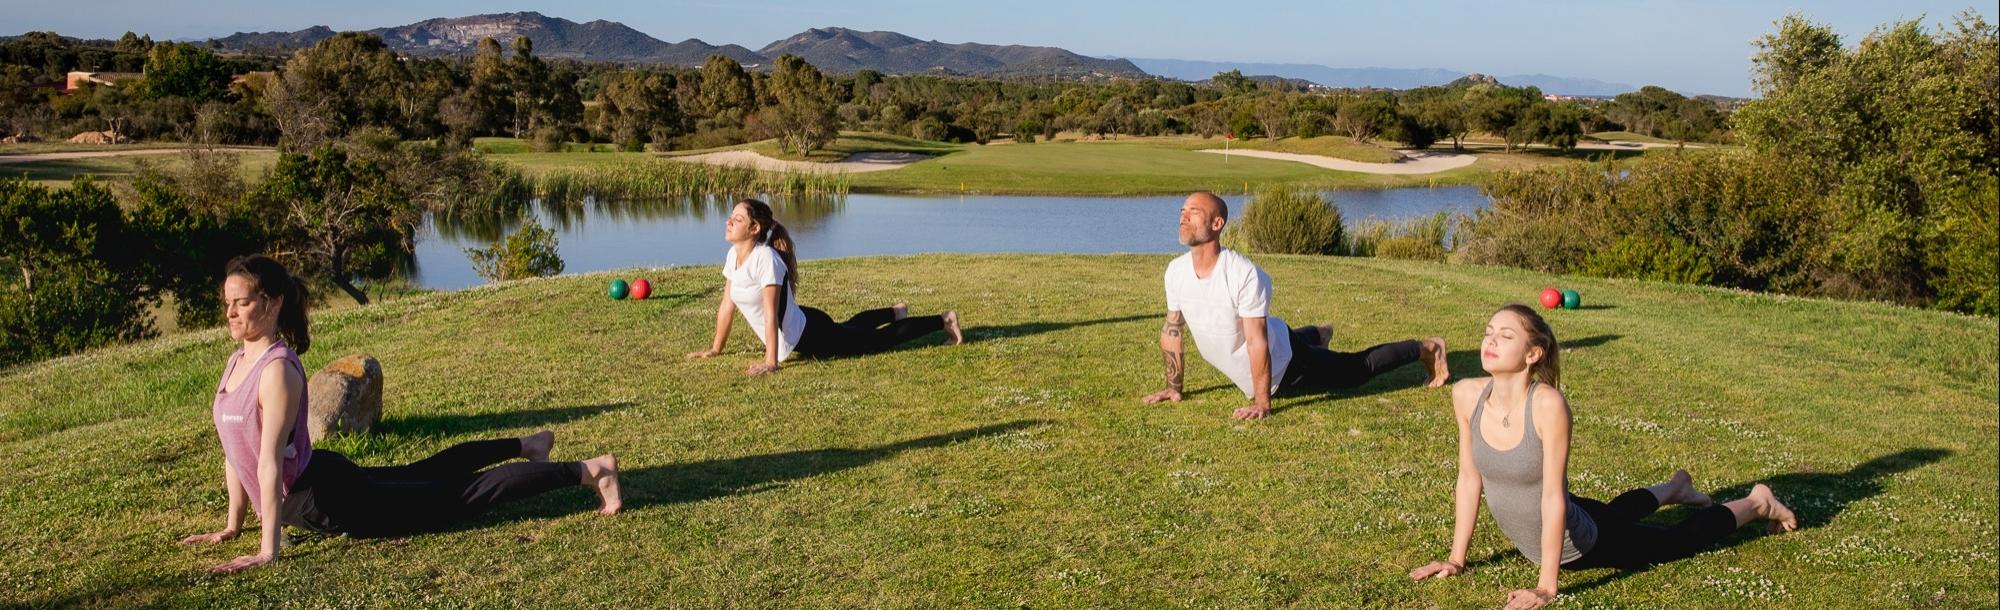 Yoga Natked a Is Molas